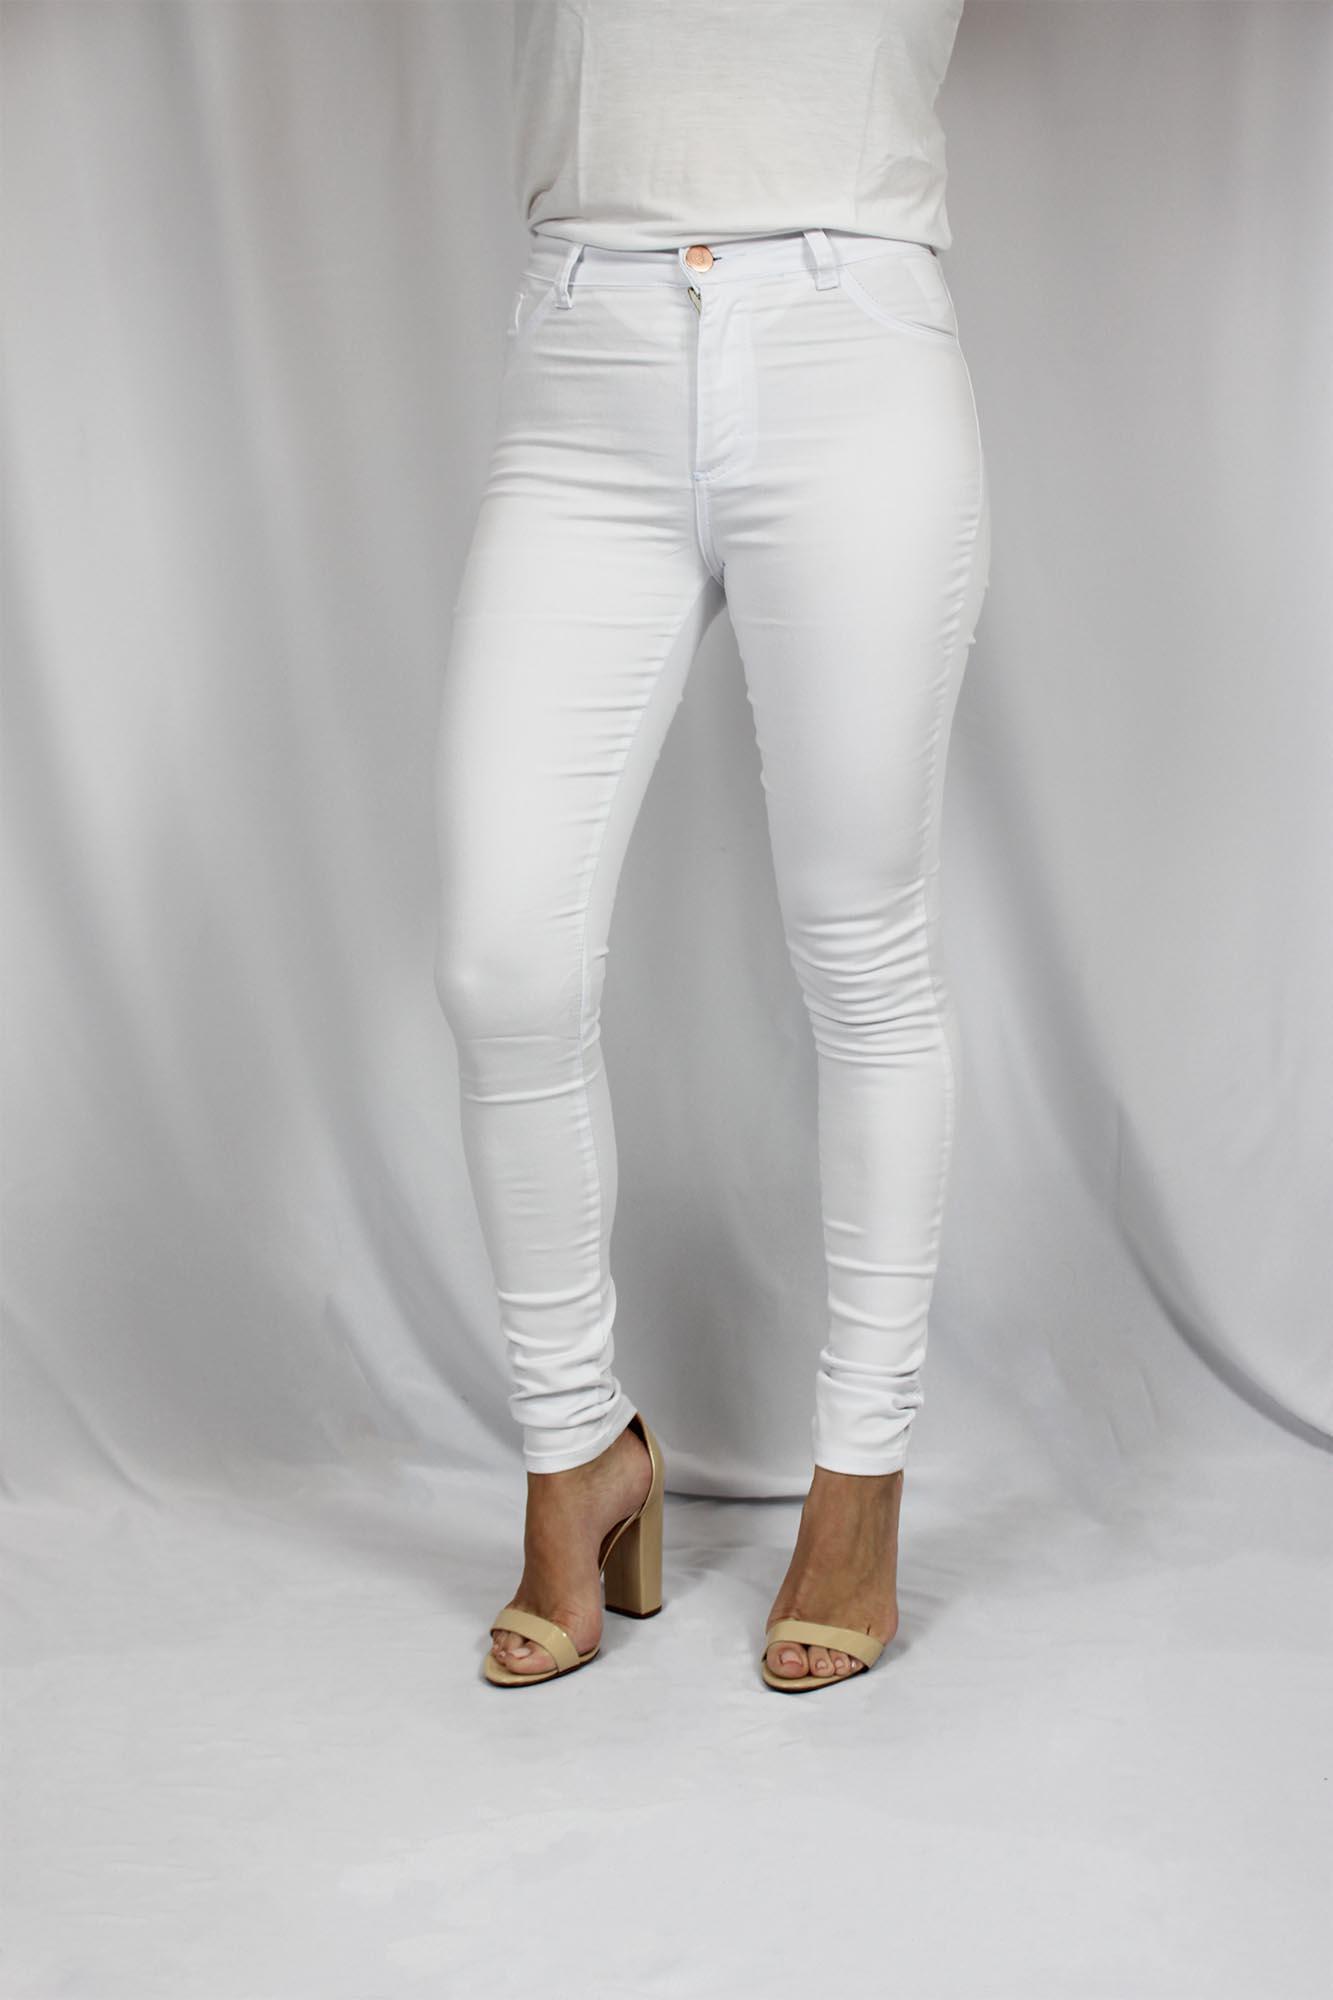 Calça Jeans Feminina - Branca